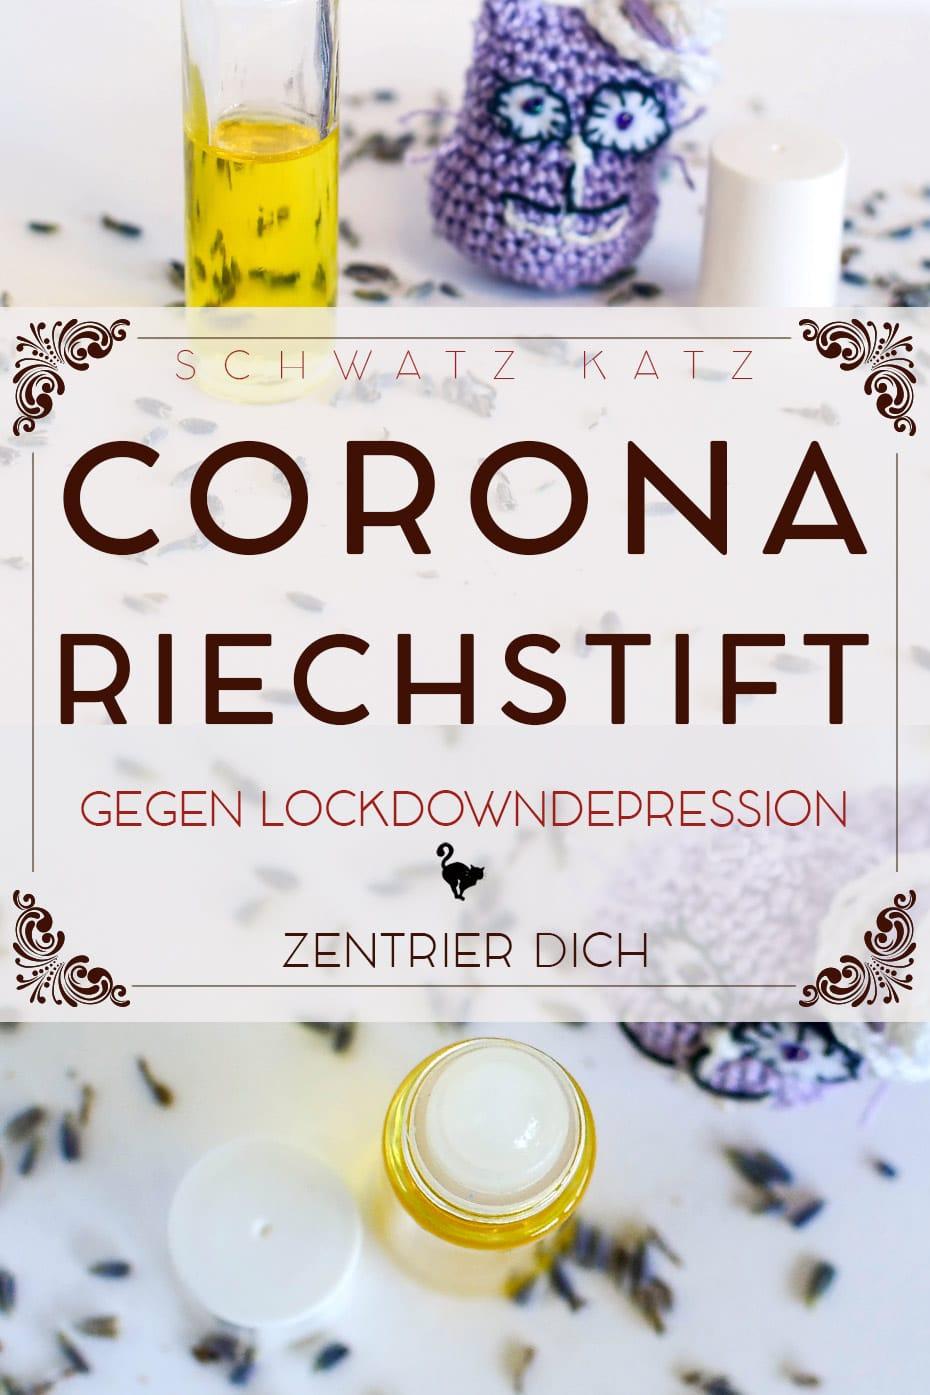 Riechstift gegen Corona-Depression | Schwatz Katz